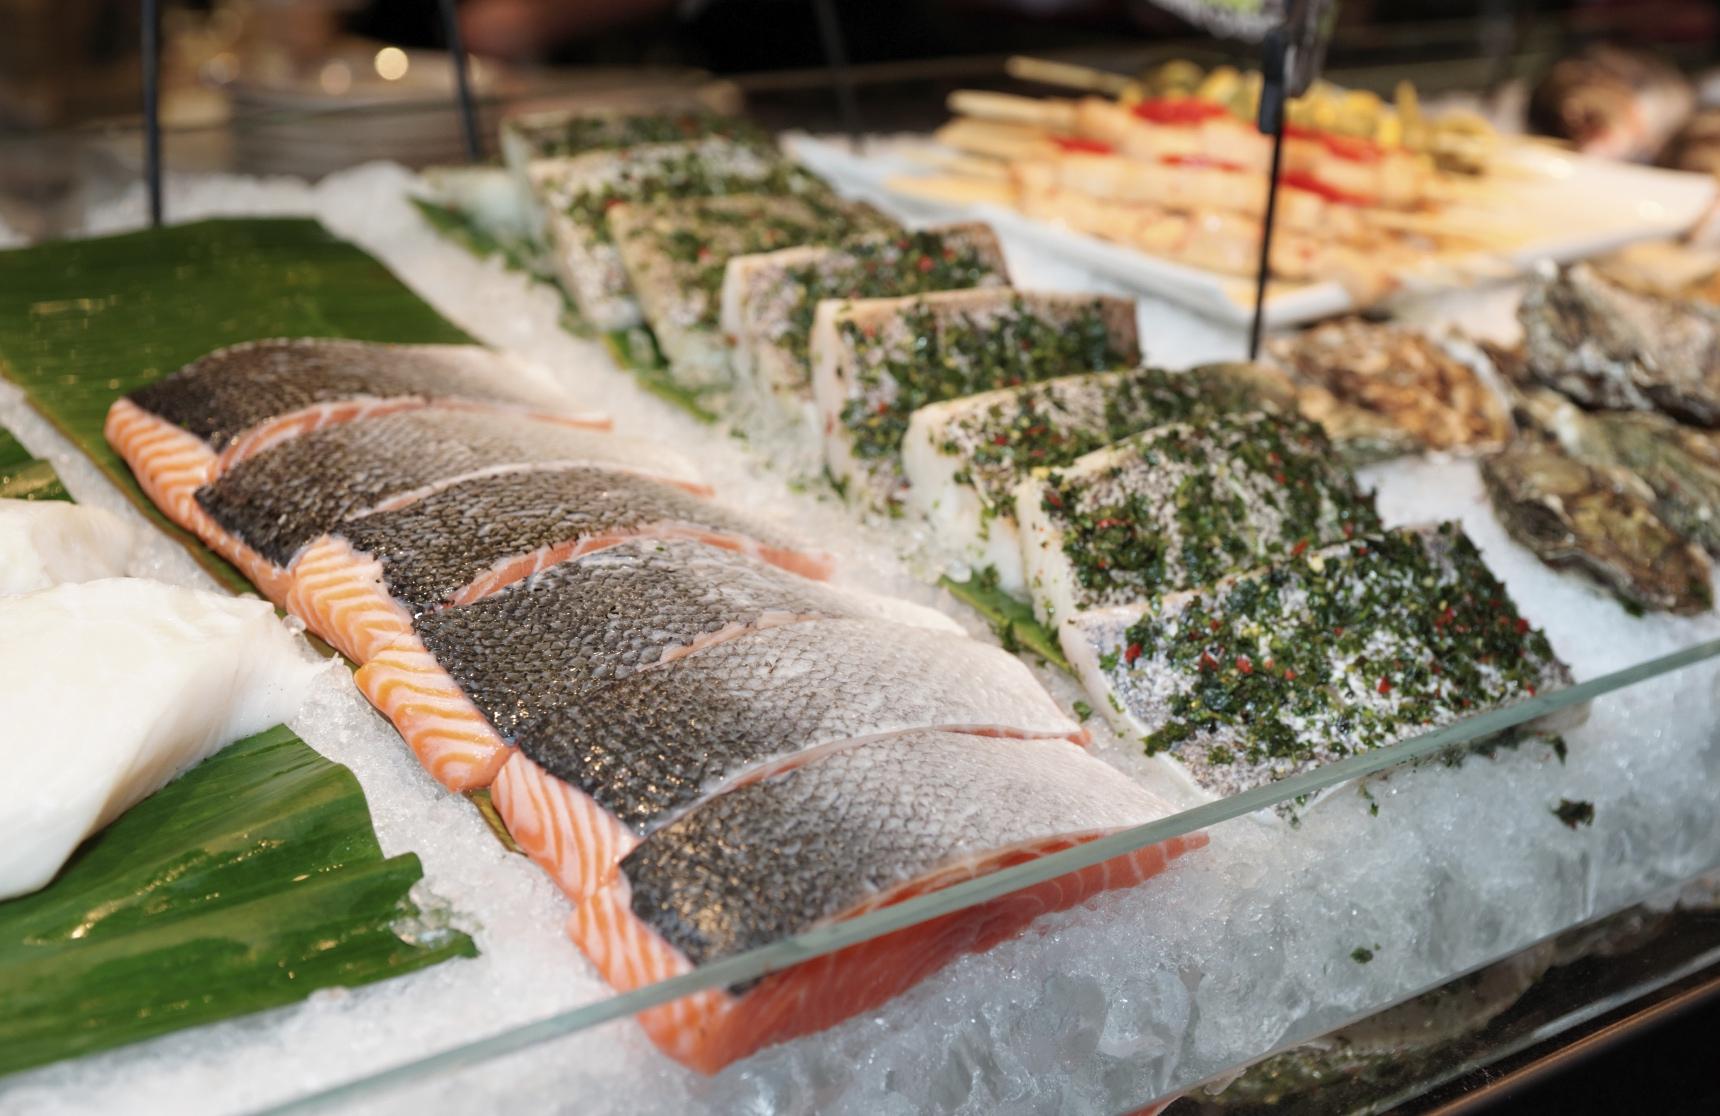 Fish steaks at the market. image: kondor83